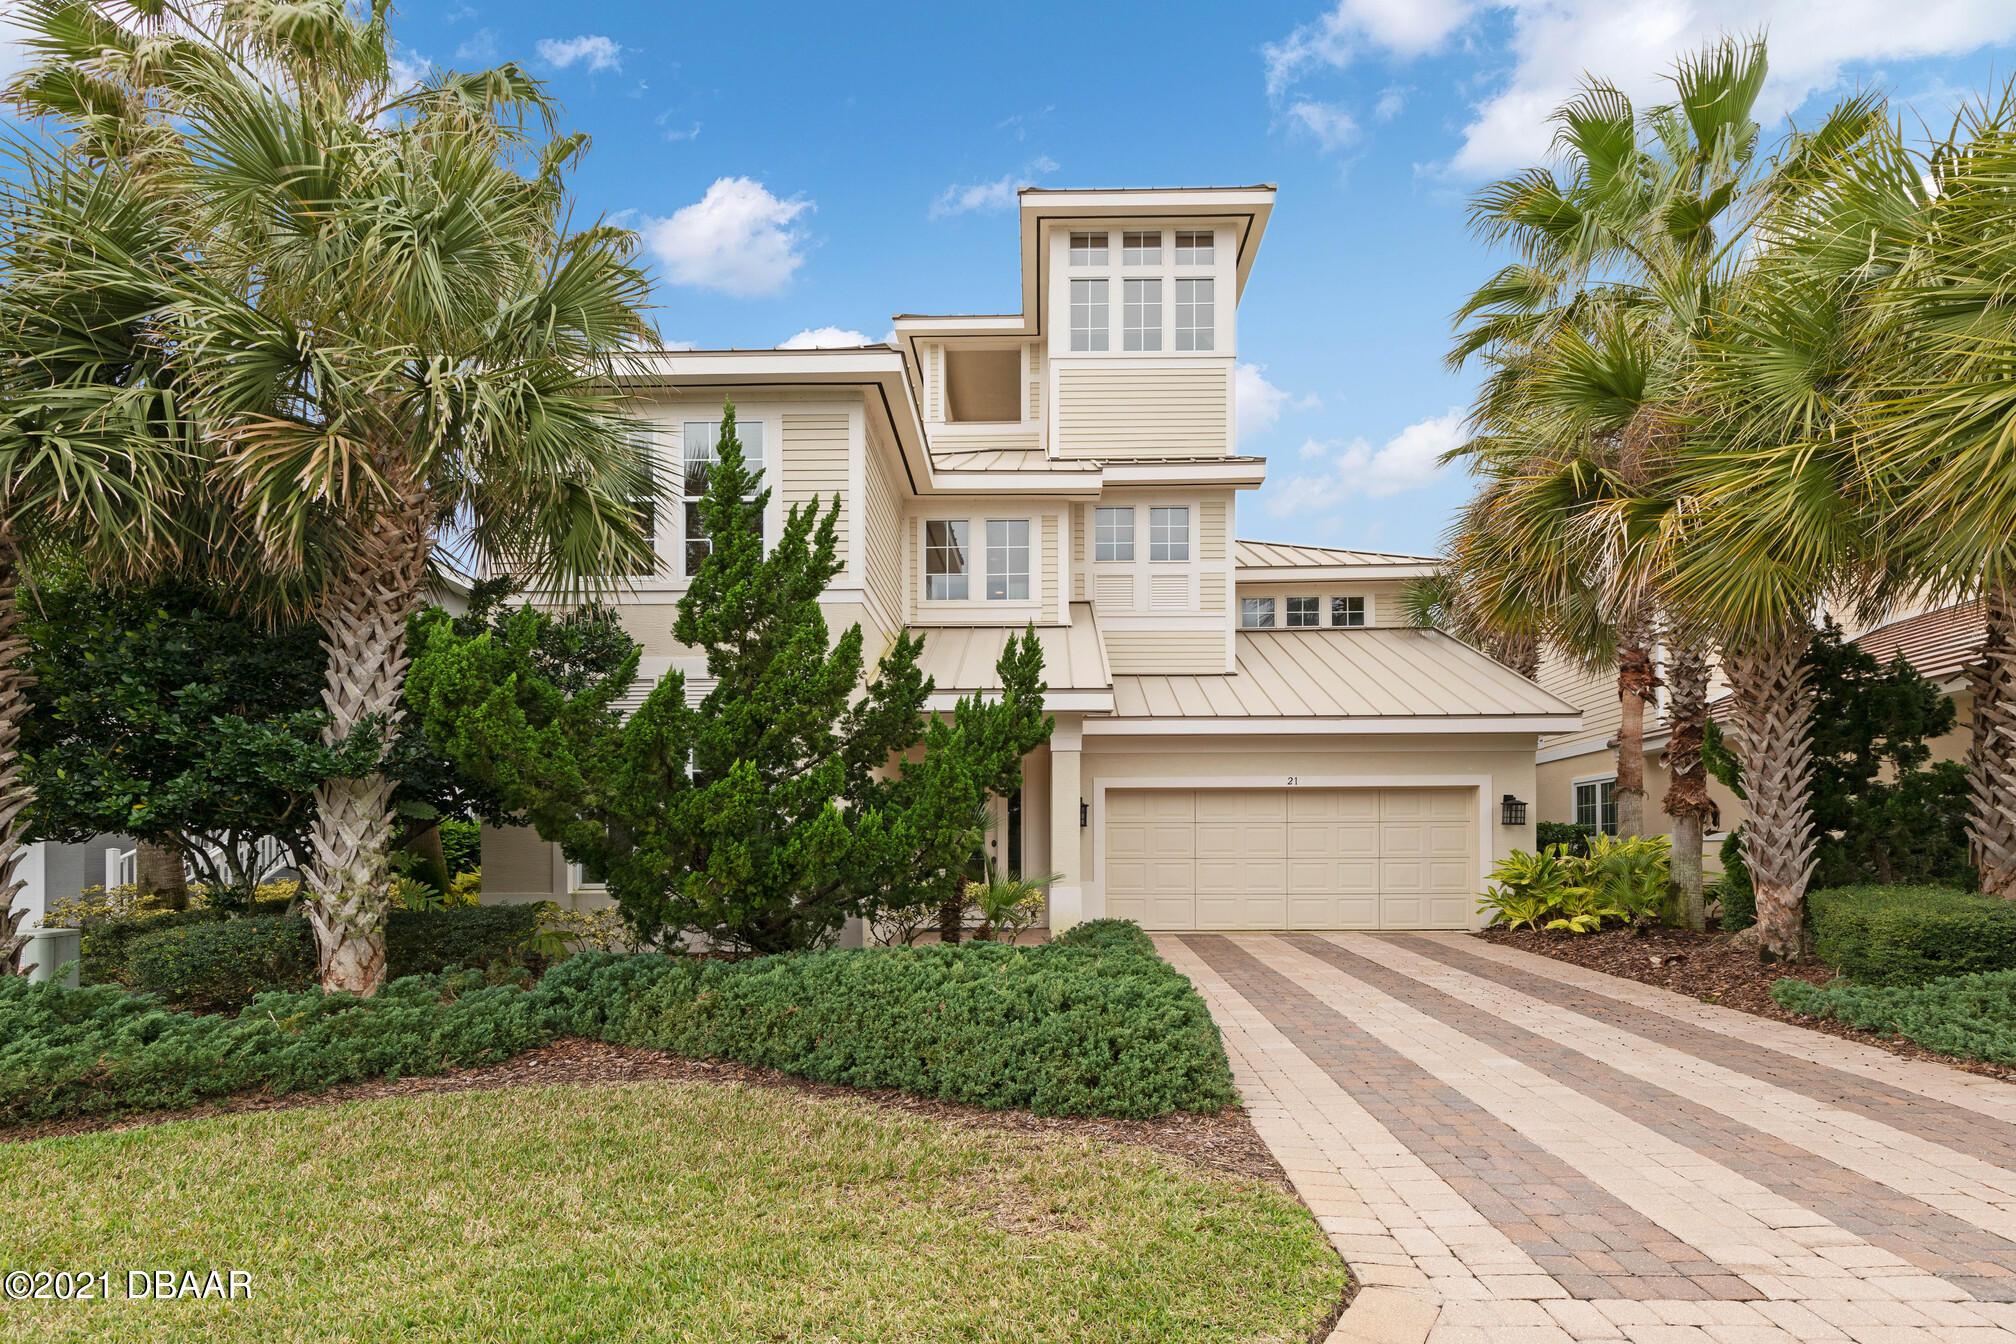 Photo of 21 Cinnamon Beach Way, Palm Coast, FL 32137